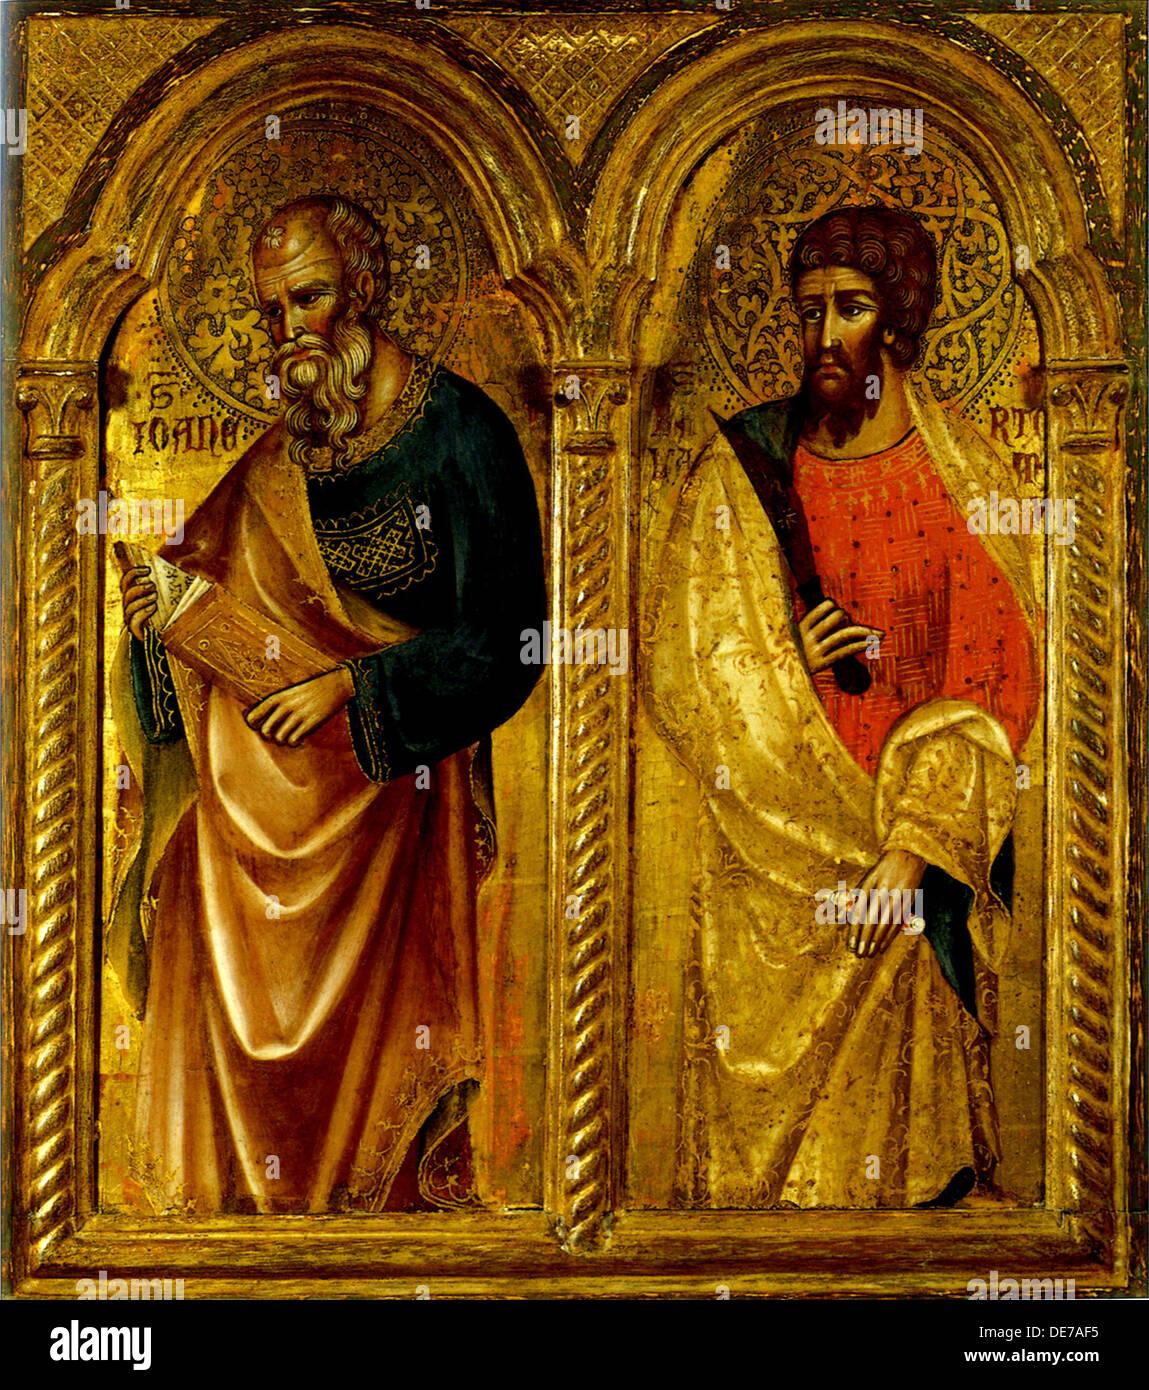 Apostles Saint James and Saint Bartholomew, ca 1345. Artist: Veneziano, Paolo (ca 1330-ca 1360) - Stock Image